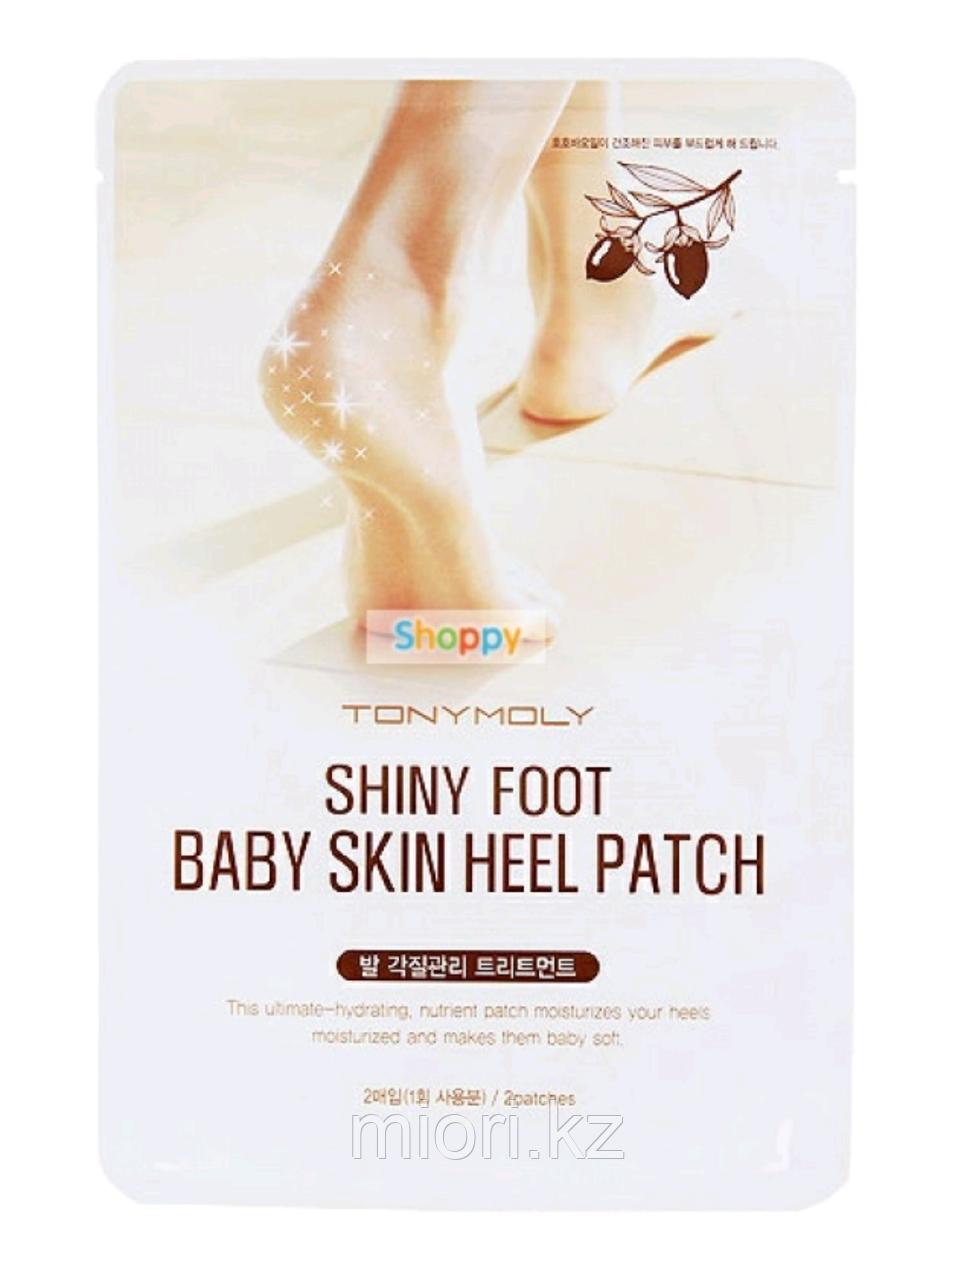 Пластырь для загрубевшей кожи пяток TonyMoly SHINY FOOT Baby Skin Heel Patch